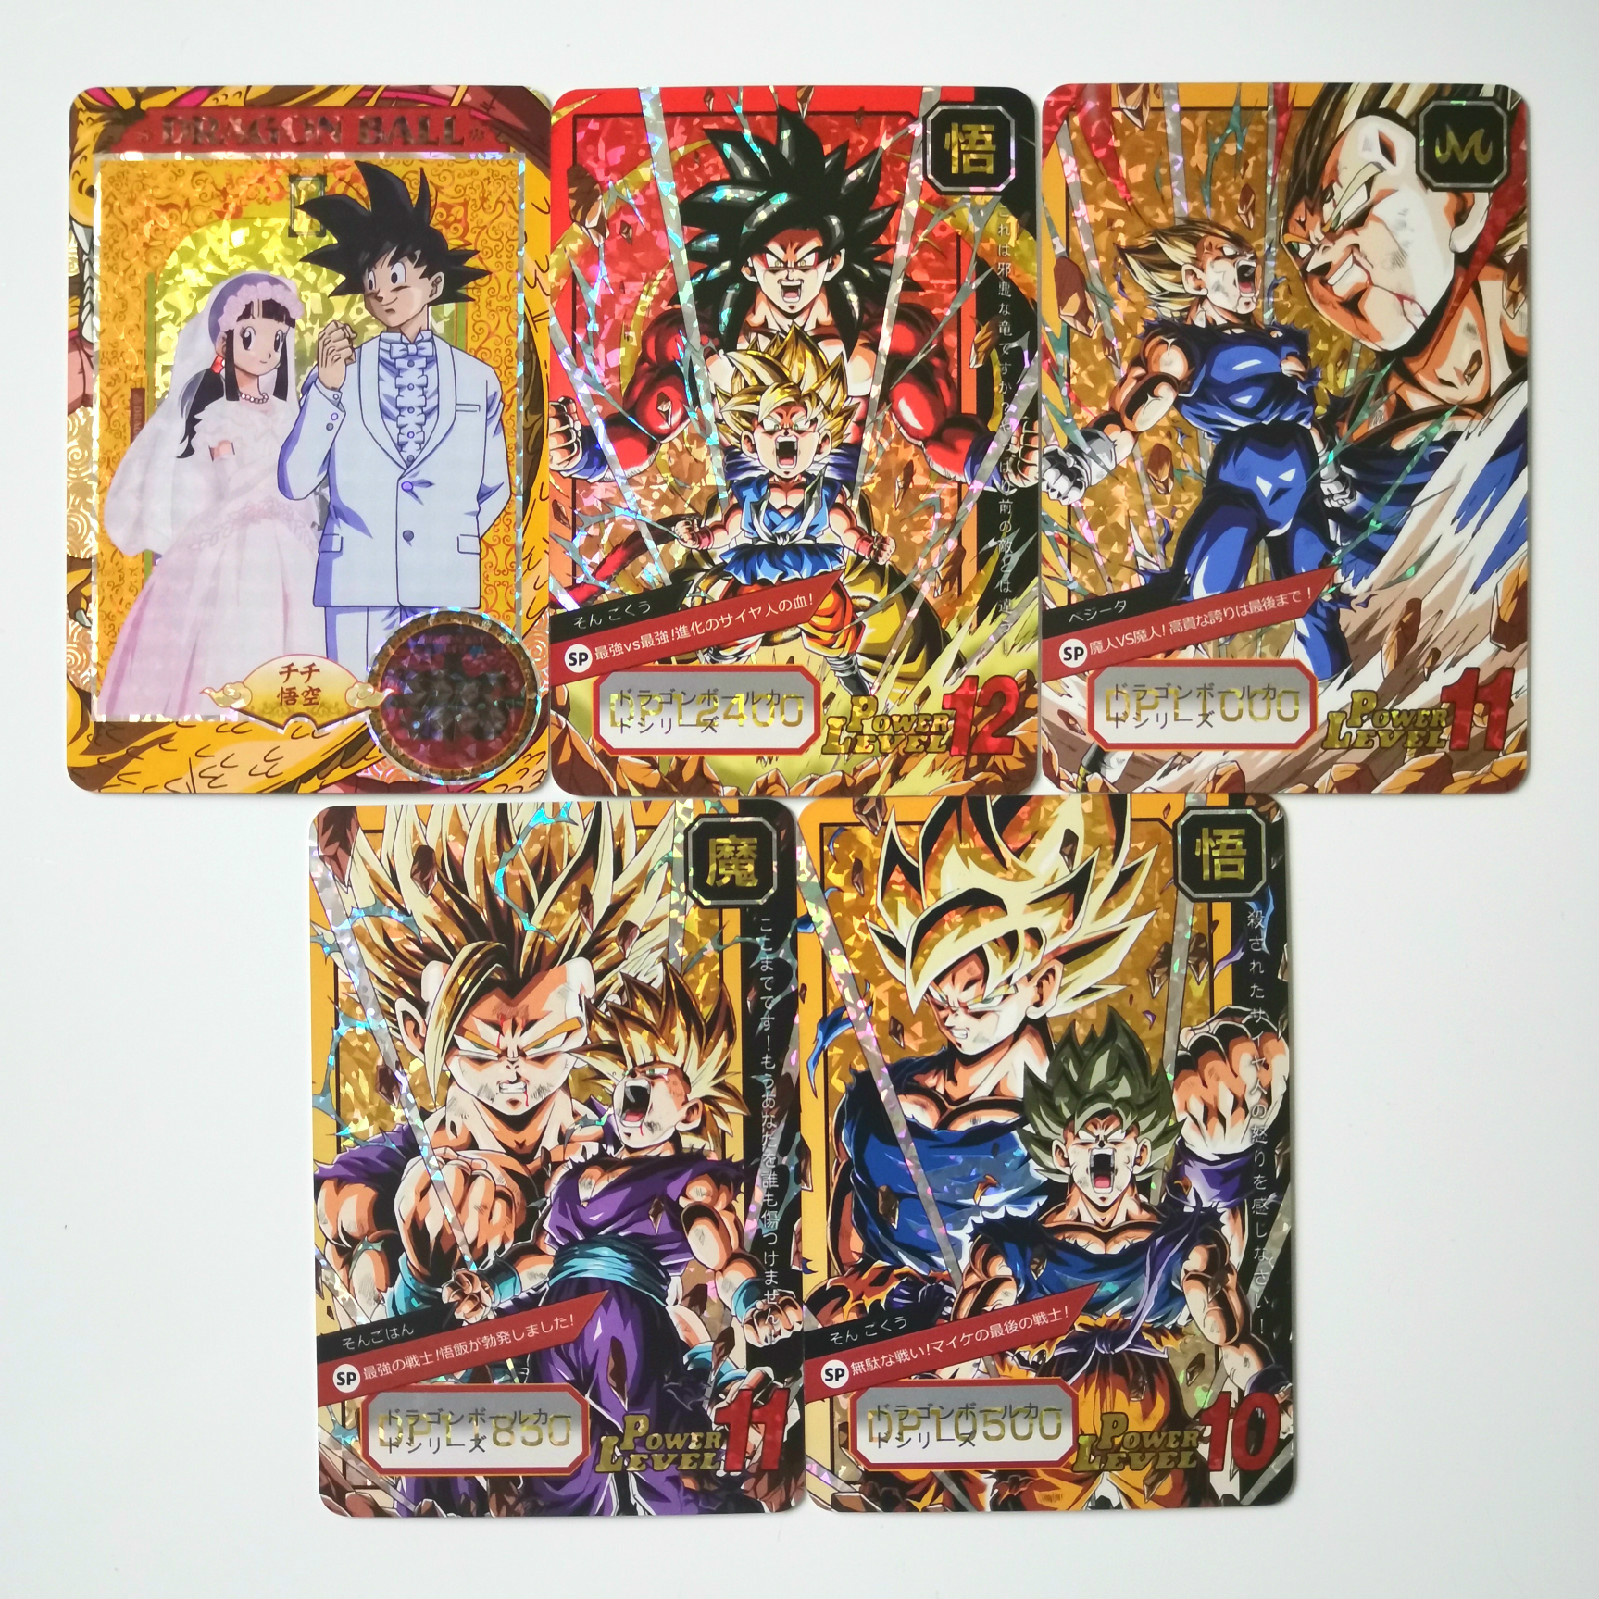 5pcs/set Super Dragon Ball Z Marry Heroes Battle Card Ultra Instinct Goku Vegeta Game Collection Cards